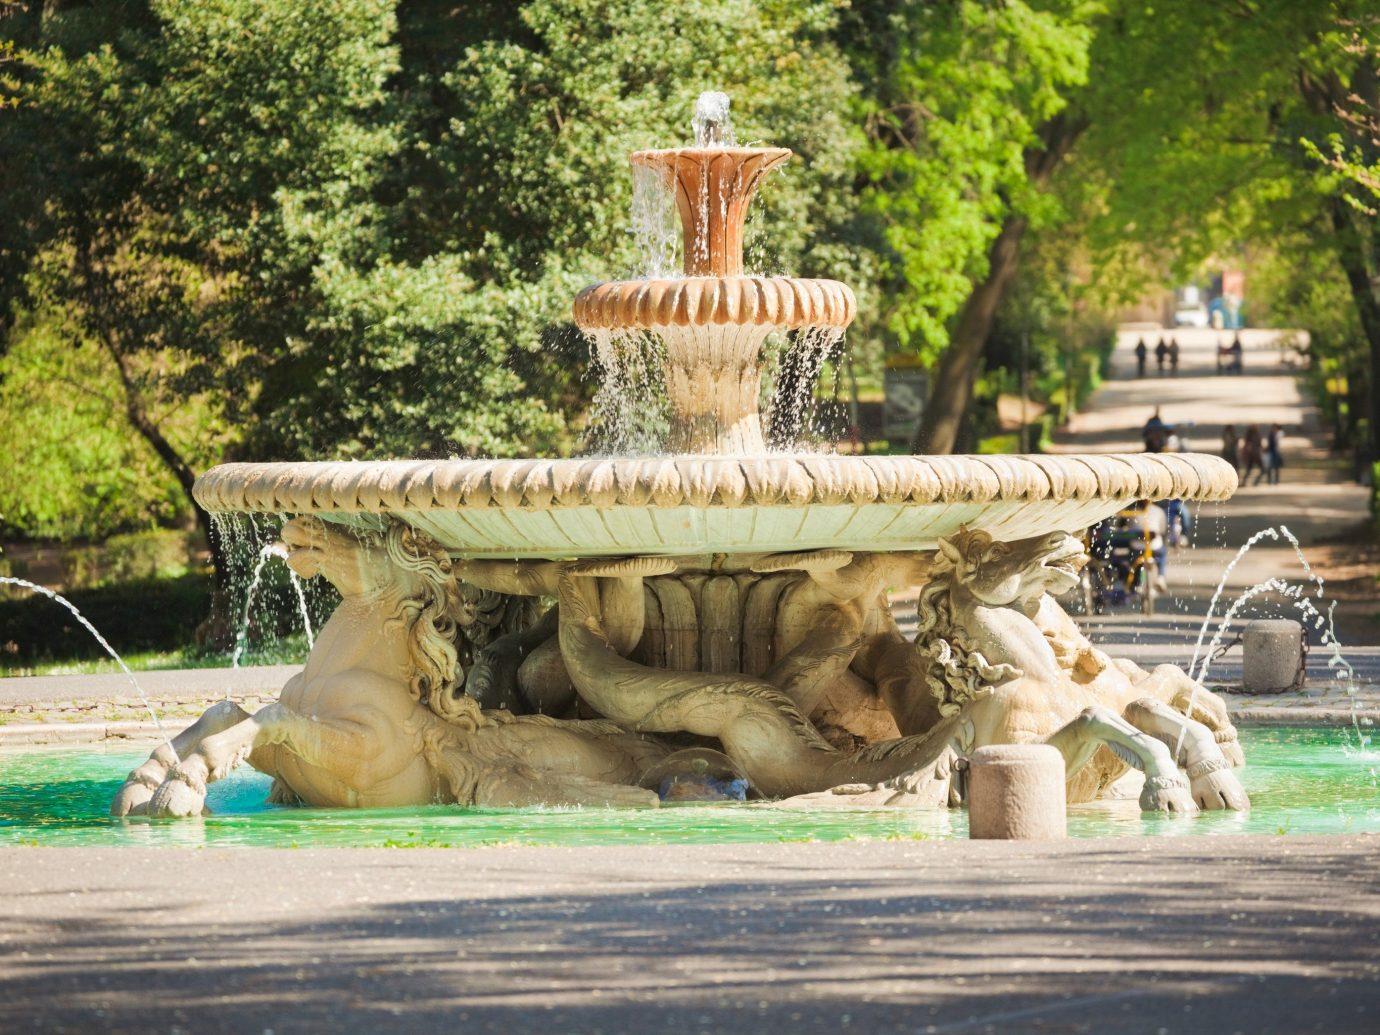 Outdoors + Adventure tree outdoor fountain water feature sculpture Garden carving